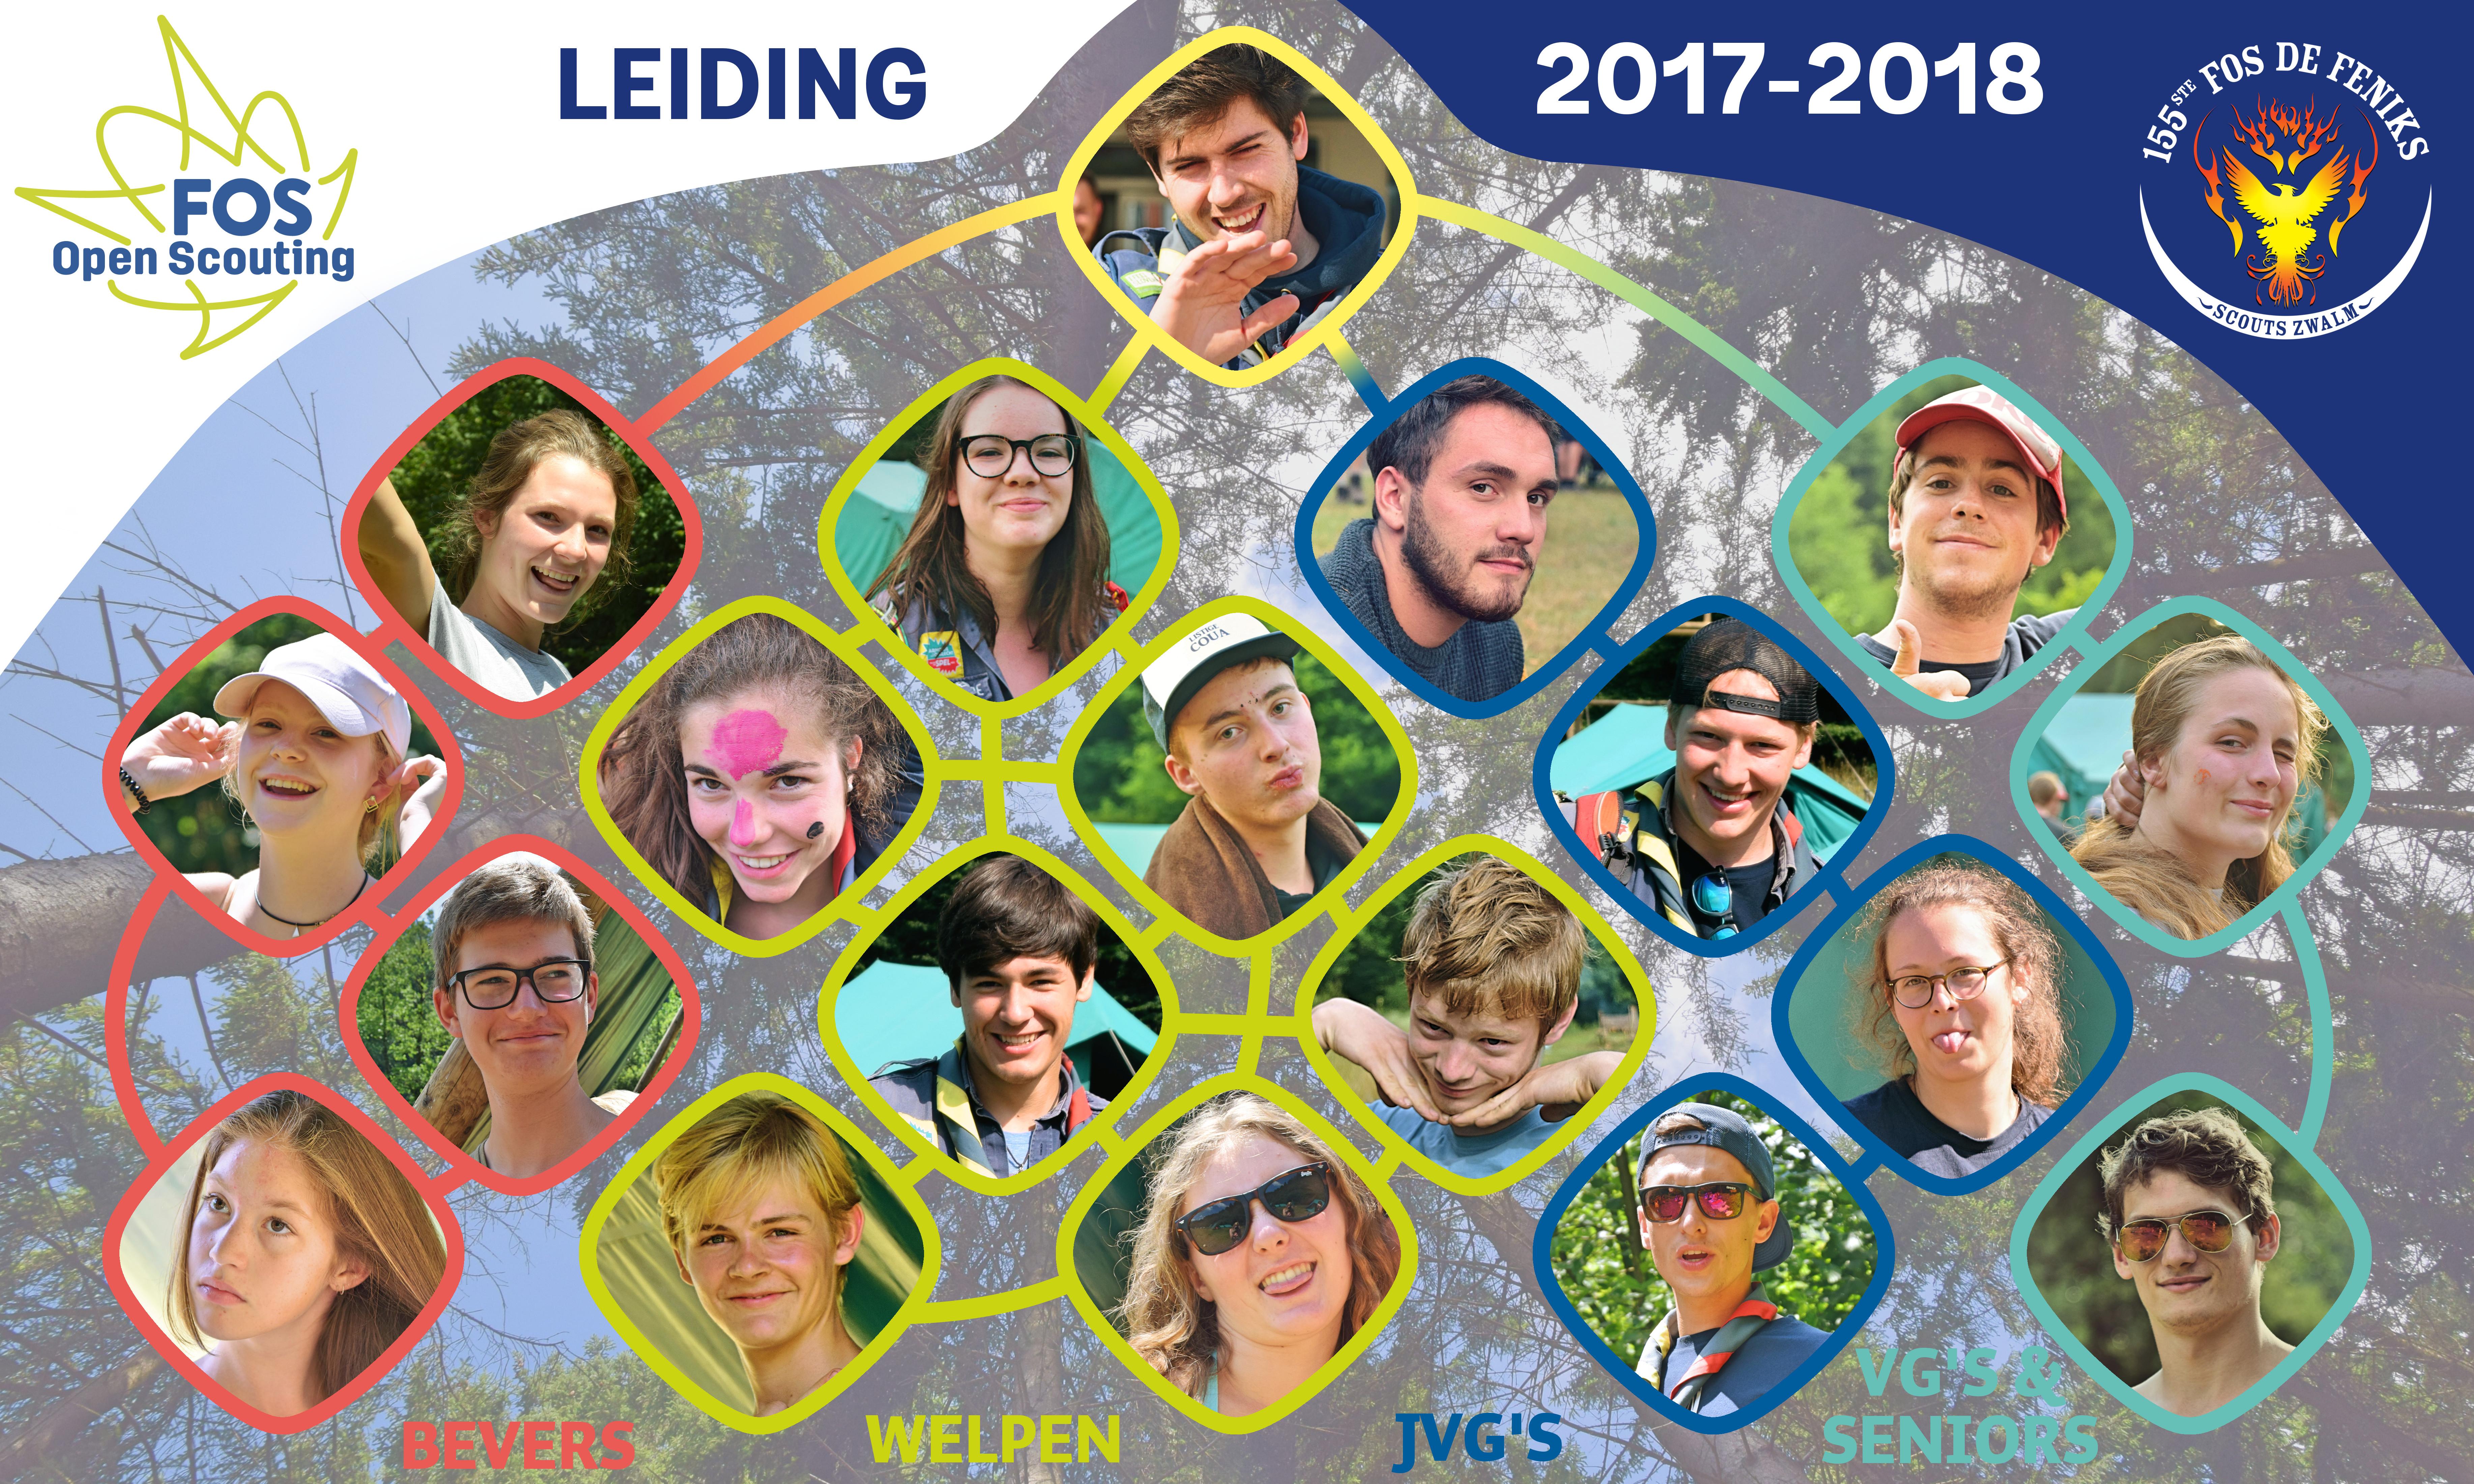 Leiding 2017-2018